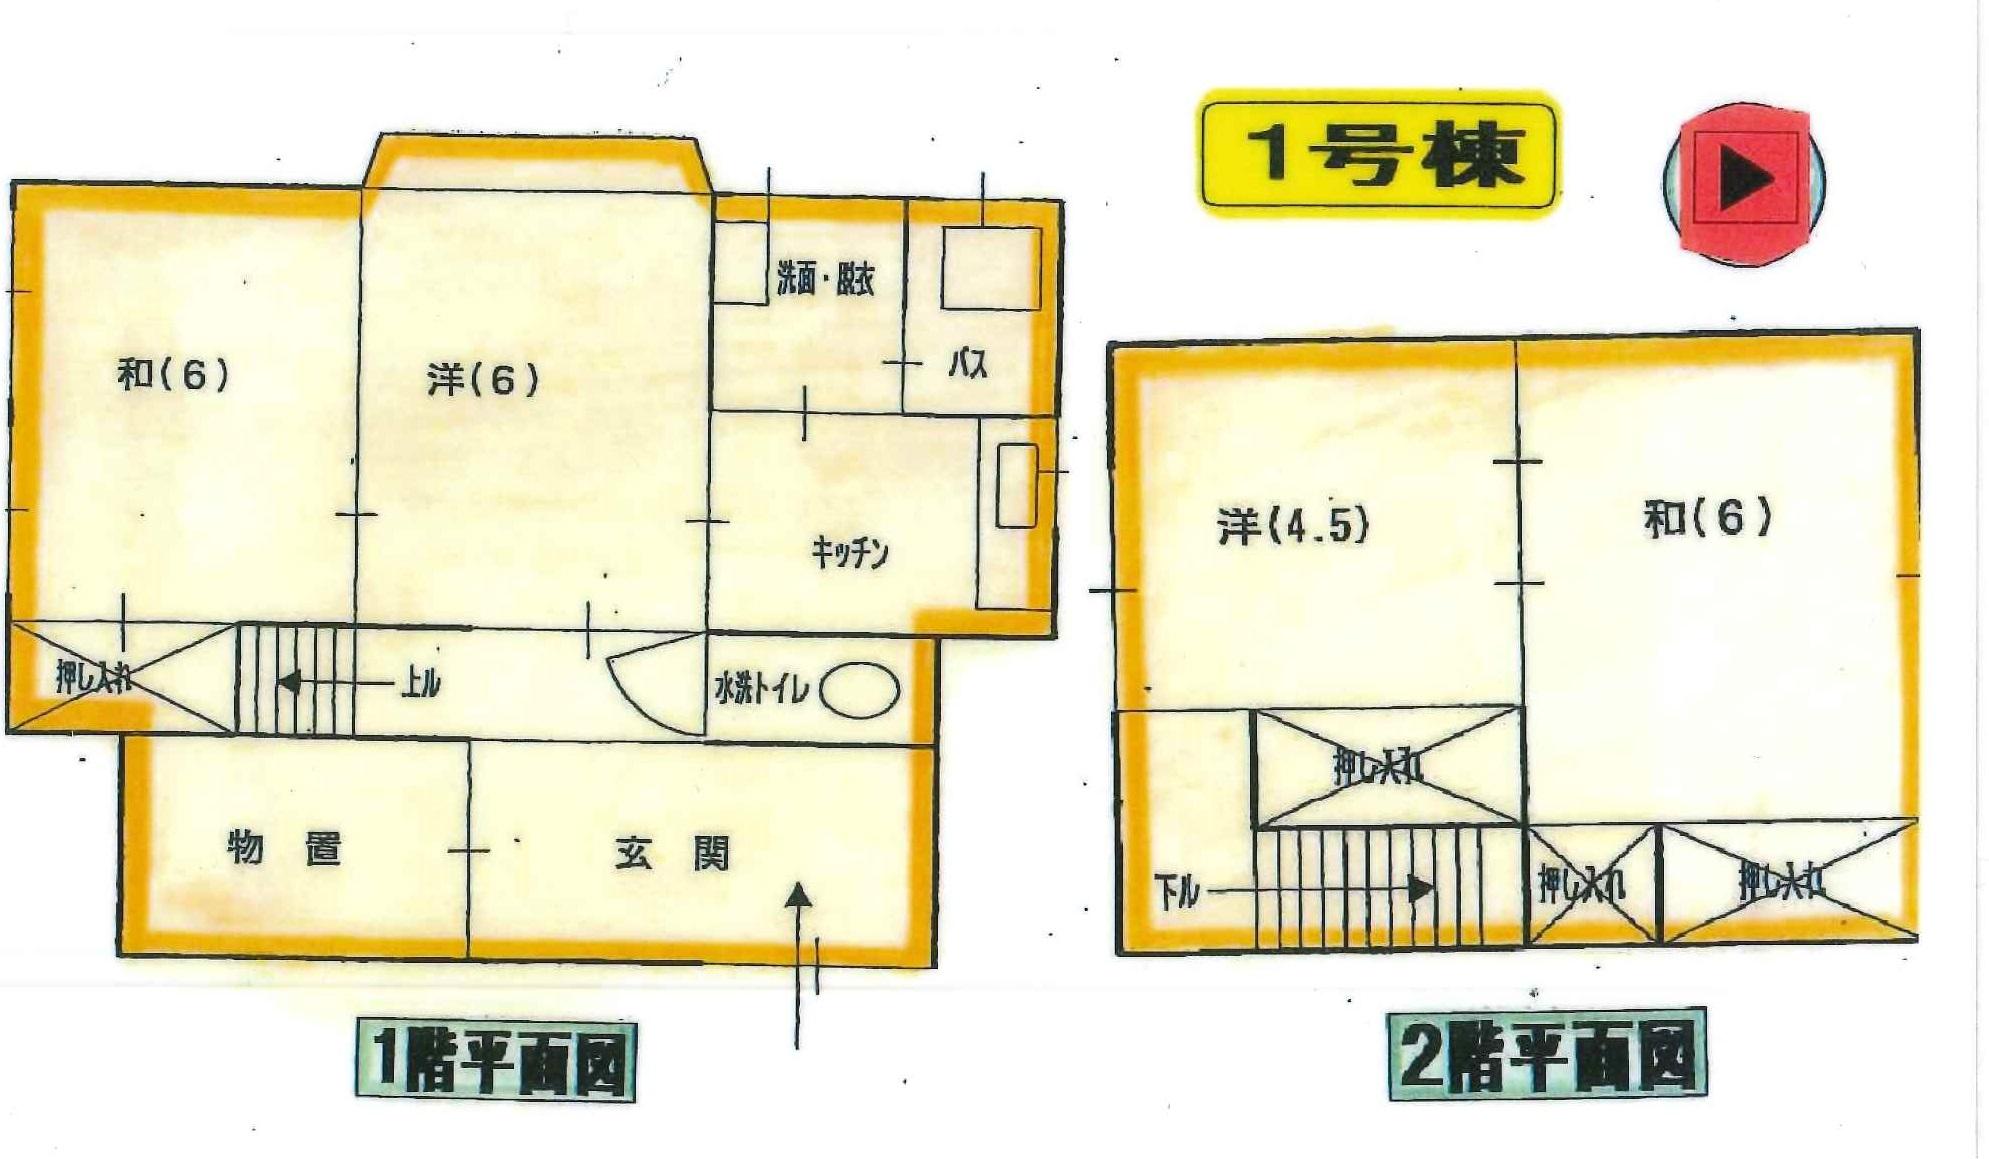 20200219135613121_0001山石住宅1号棟 平面図